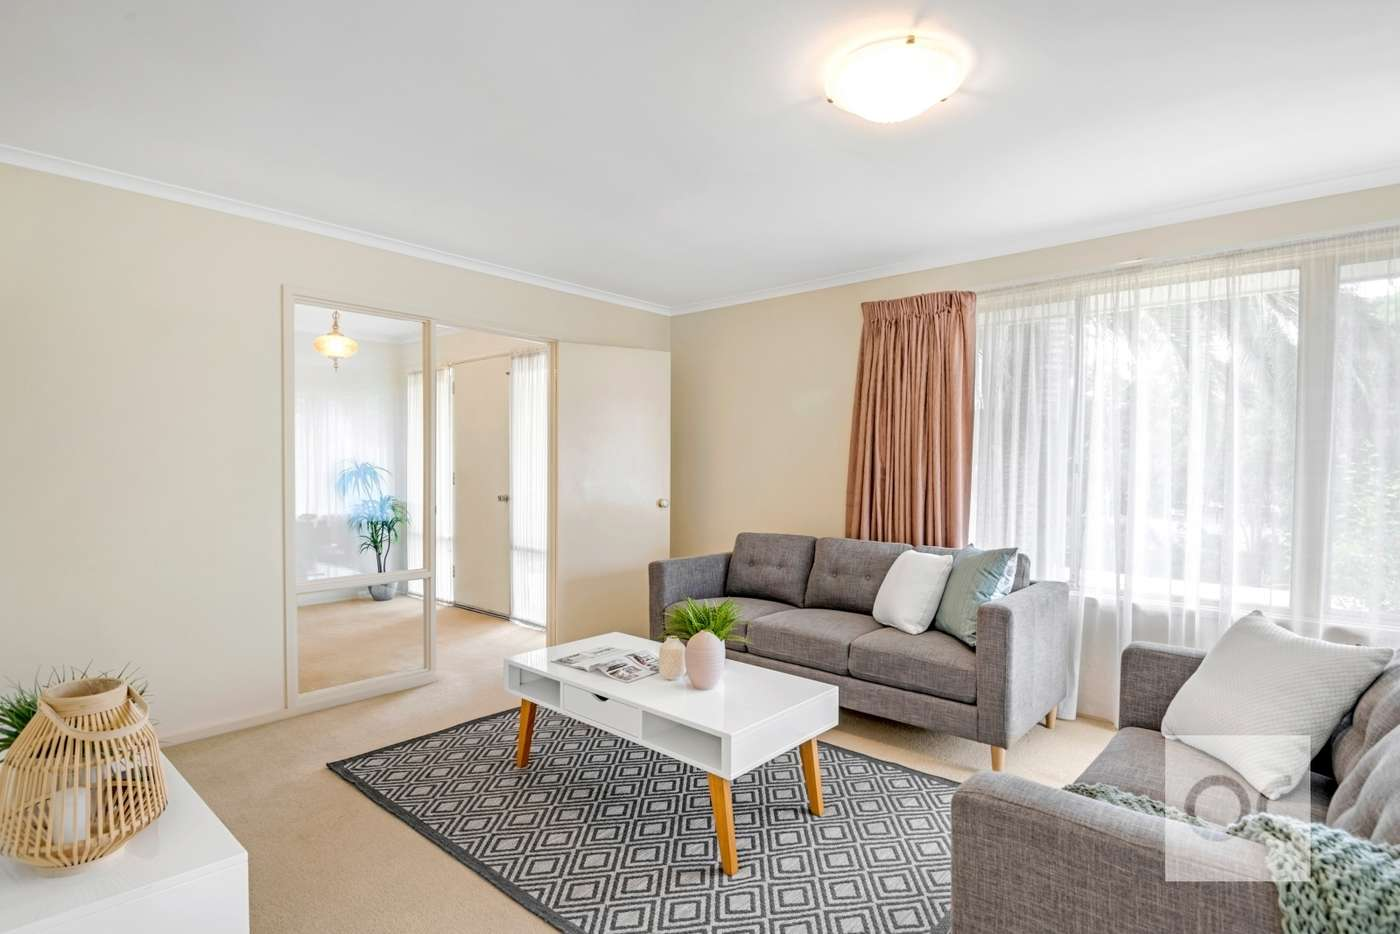 Sixth view of Homely house listing, 1 Pepe Court, Modbury North SA 5092